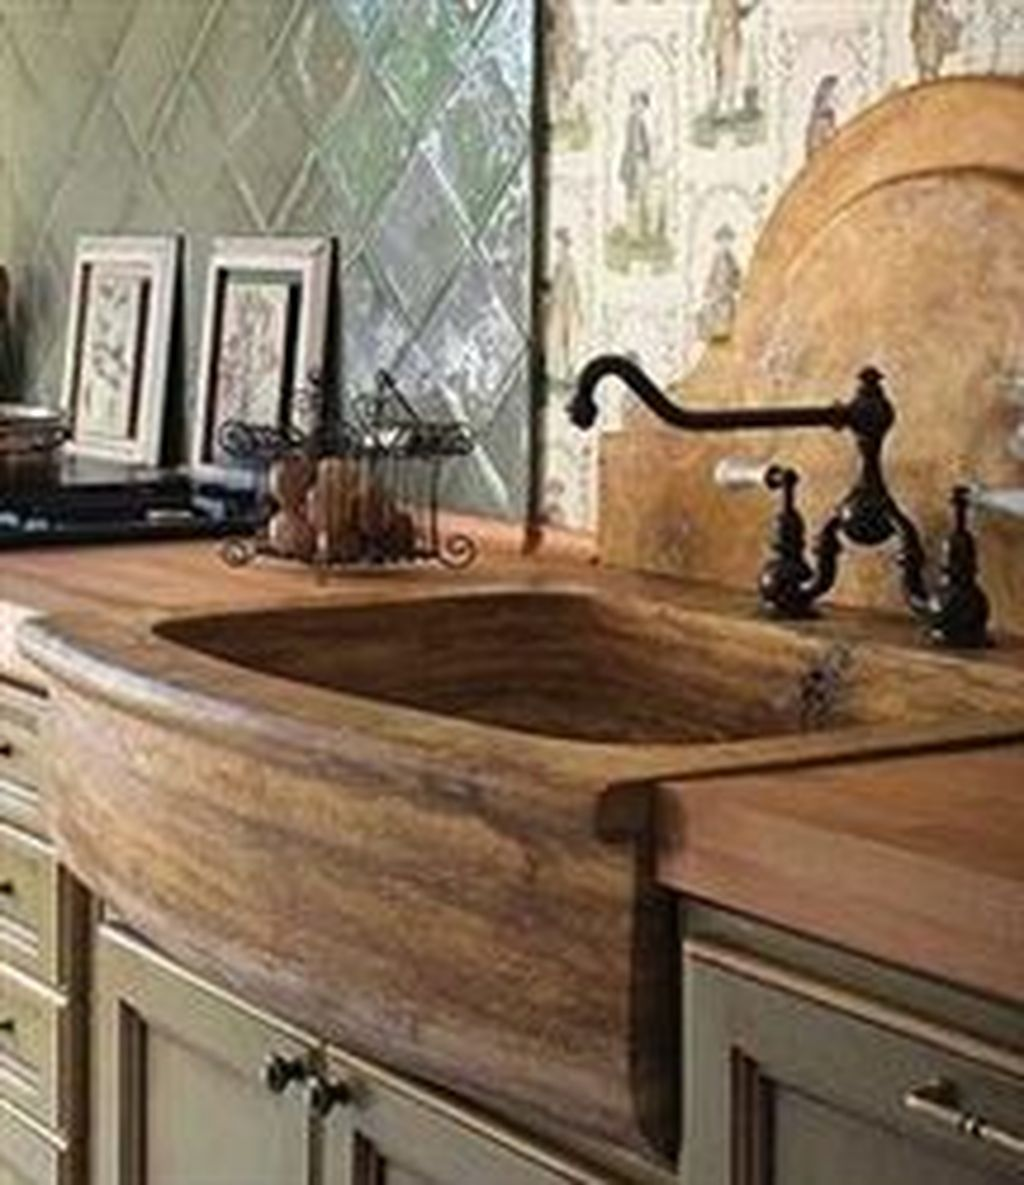 34 The Best Farmhouse Kitchen Sink Ideas Stone Farmhouse Sink Kohler Farmhouse Sink Farmhouse Sink Kitchen